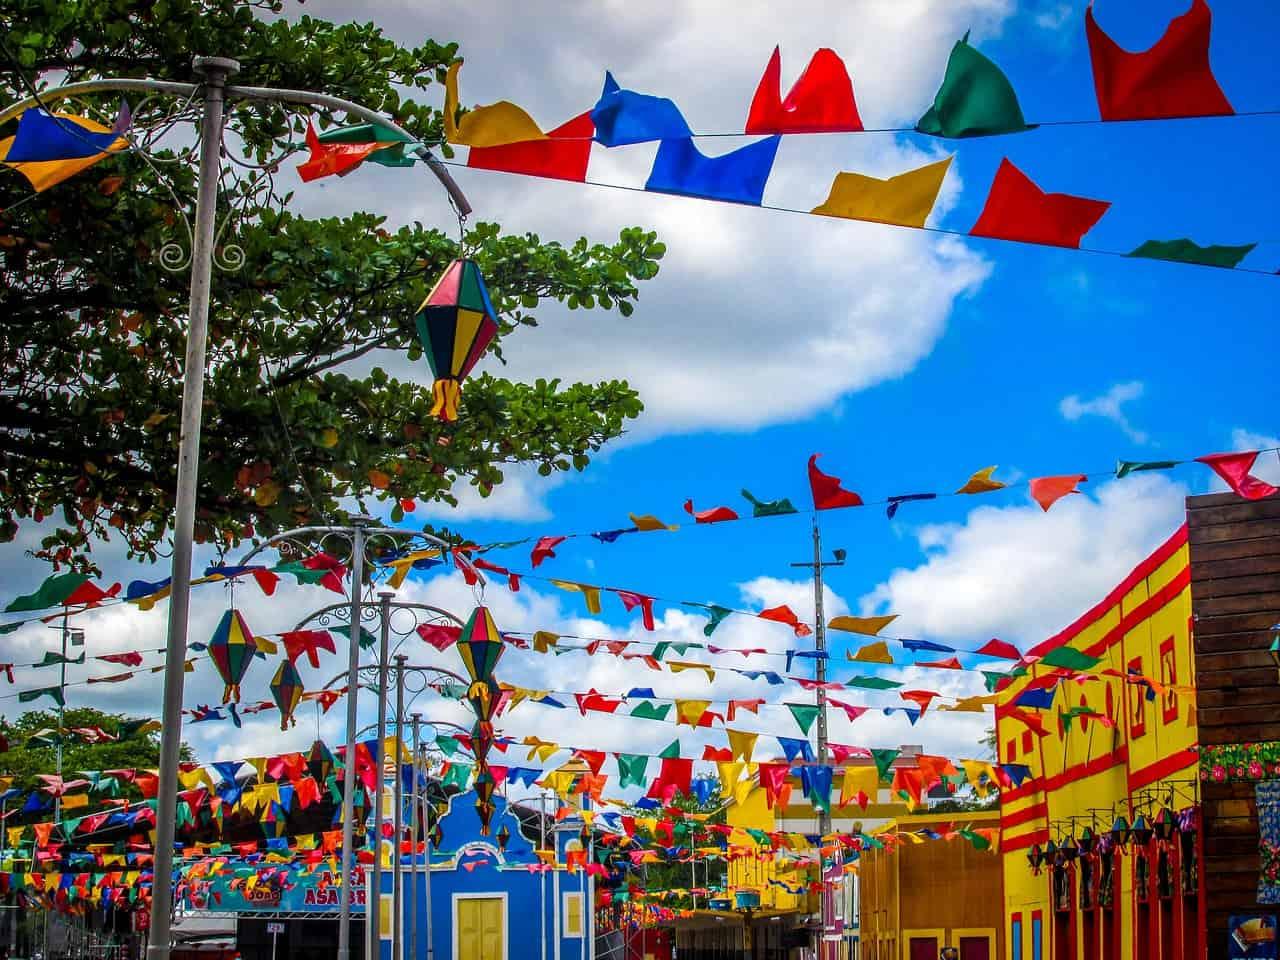 Pernambuco Urlaub in Brasilien 869,00€ - Südamerika Deals